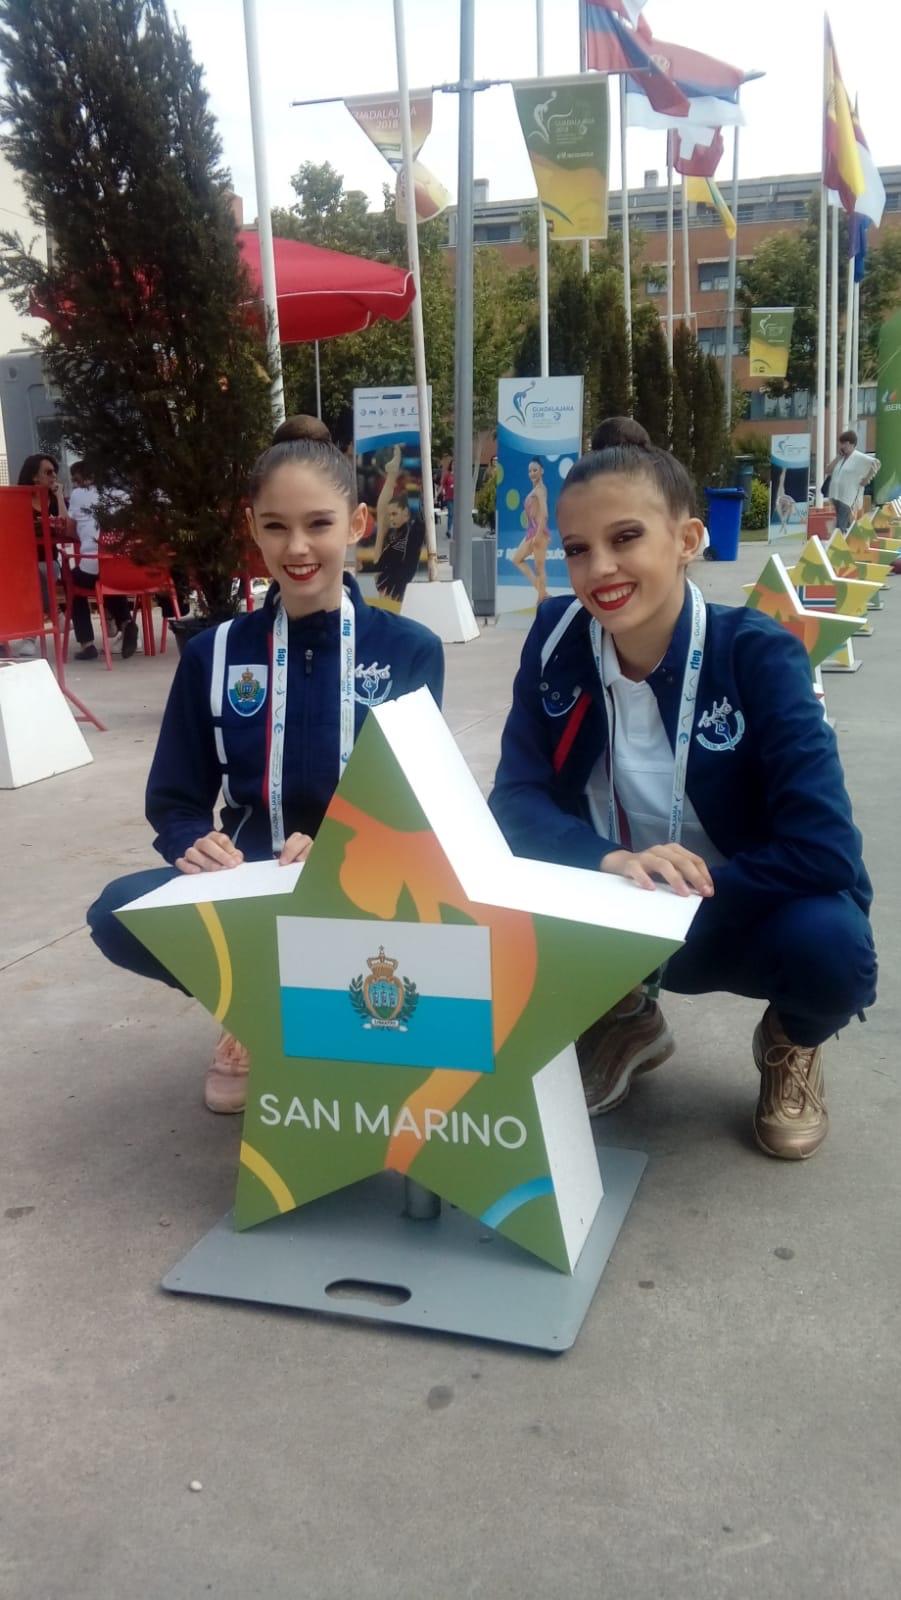 Guadalajara-Campionati europei di ginnastica ritmica 2018- Casali Giulia - Elettra Massini